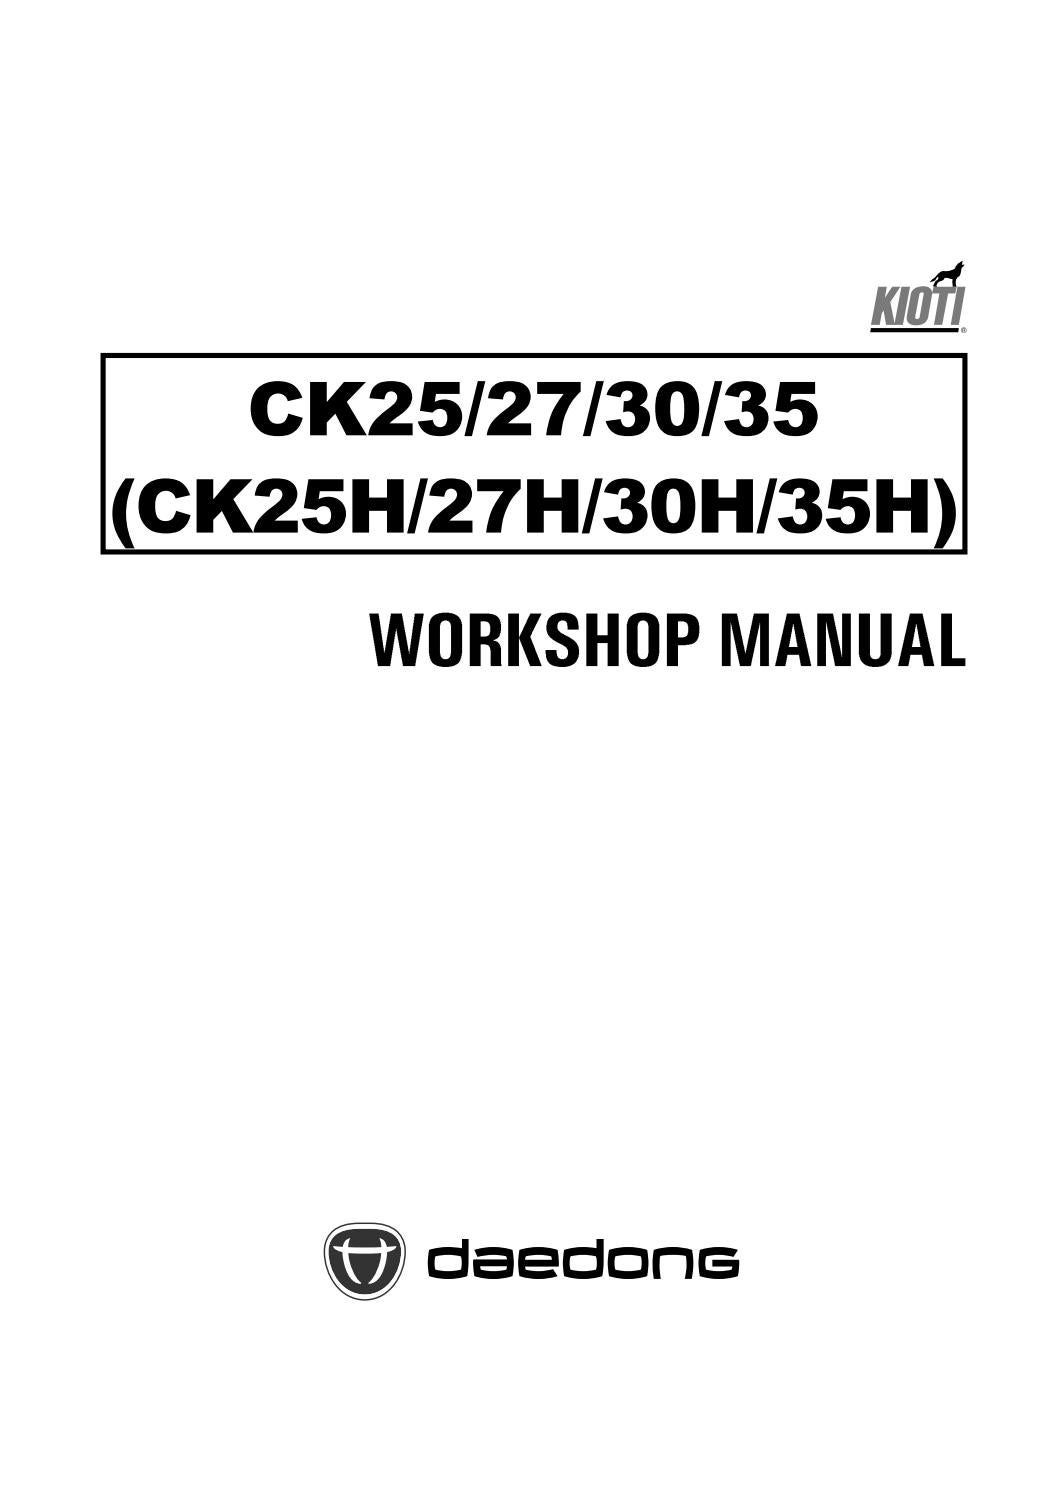 Kioti Daedong Ck35 Tractor Service Repair Manual By 163757 Issuu